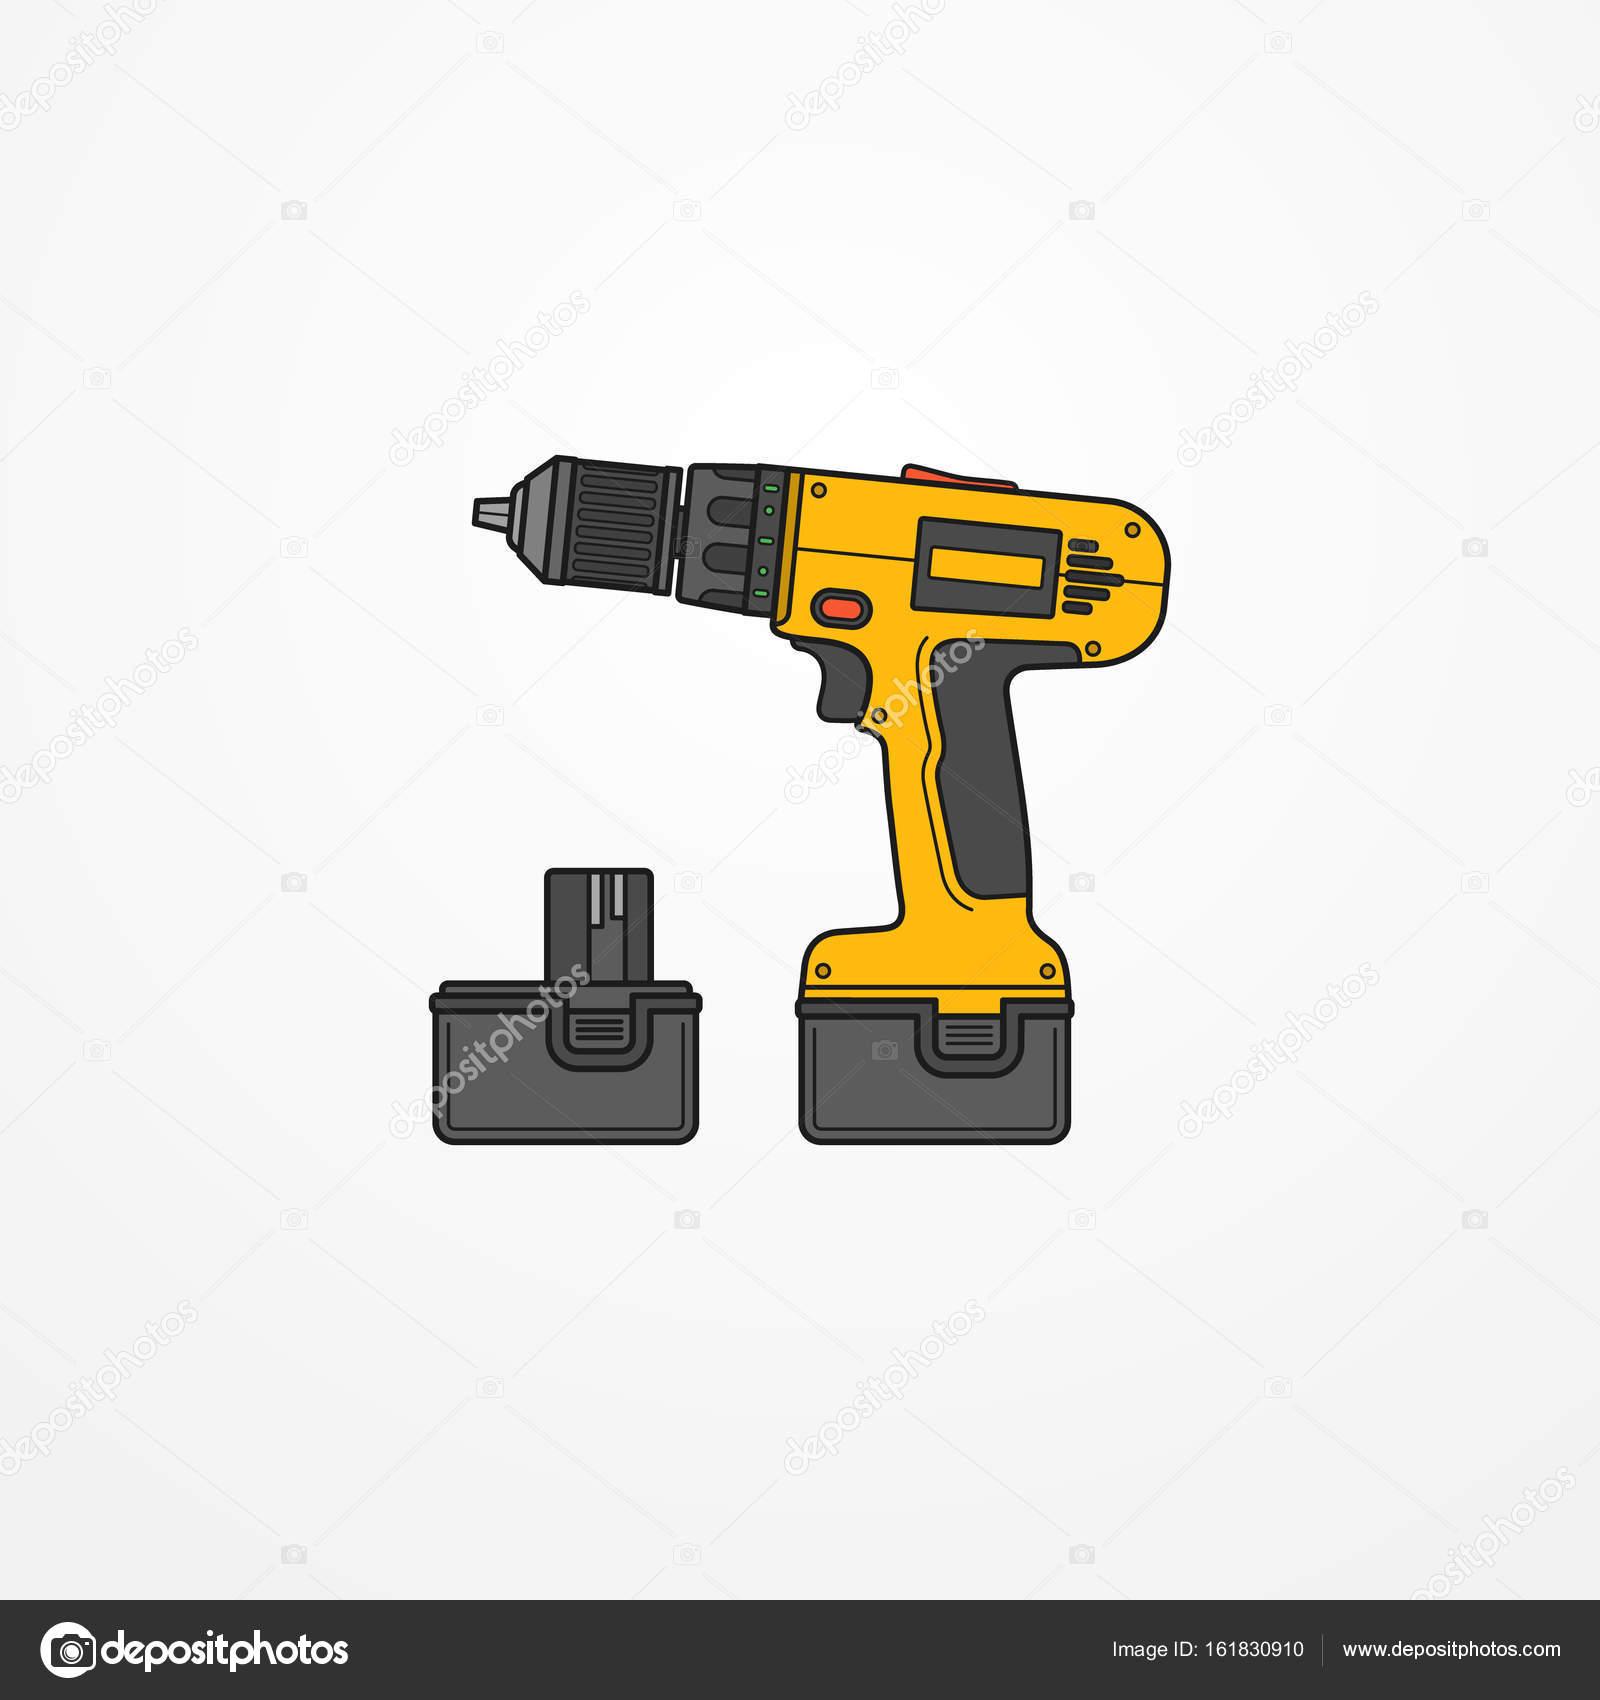 elektro akkuschrauber vektor-bild — stockvektor © zag_awd #161830910